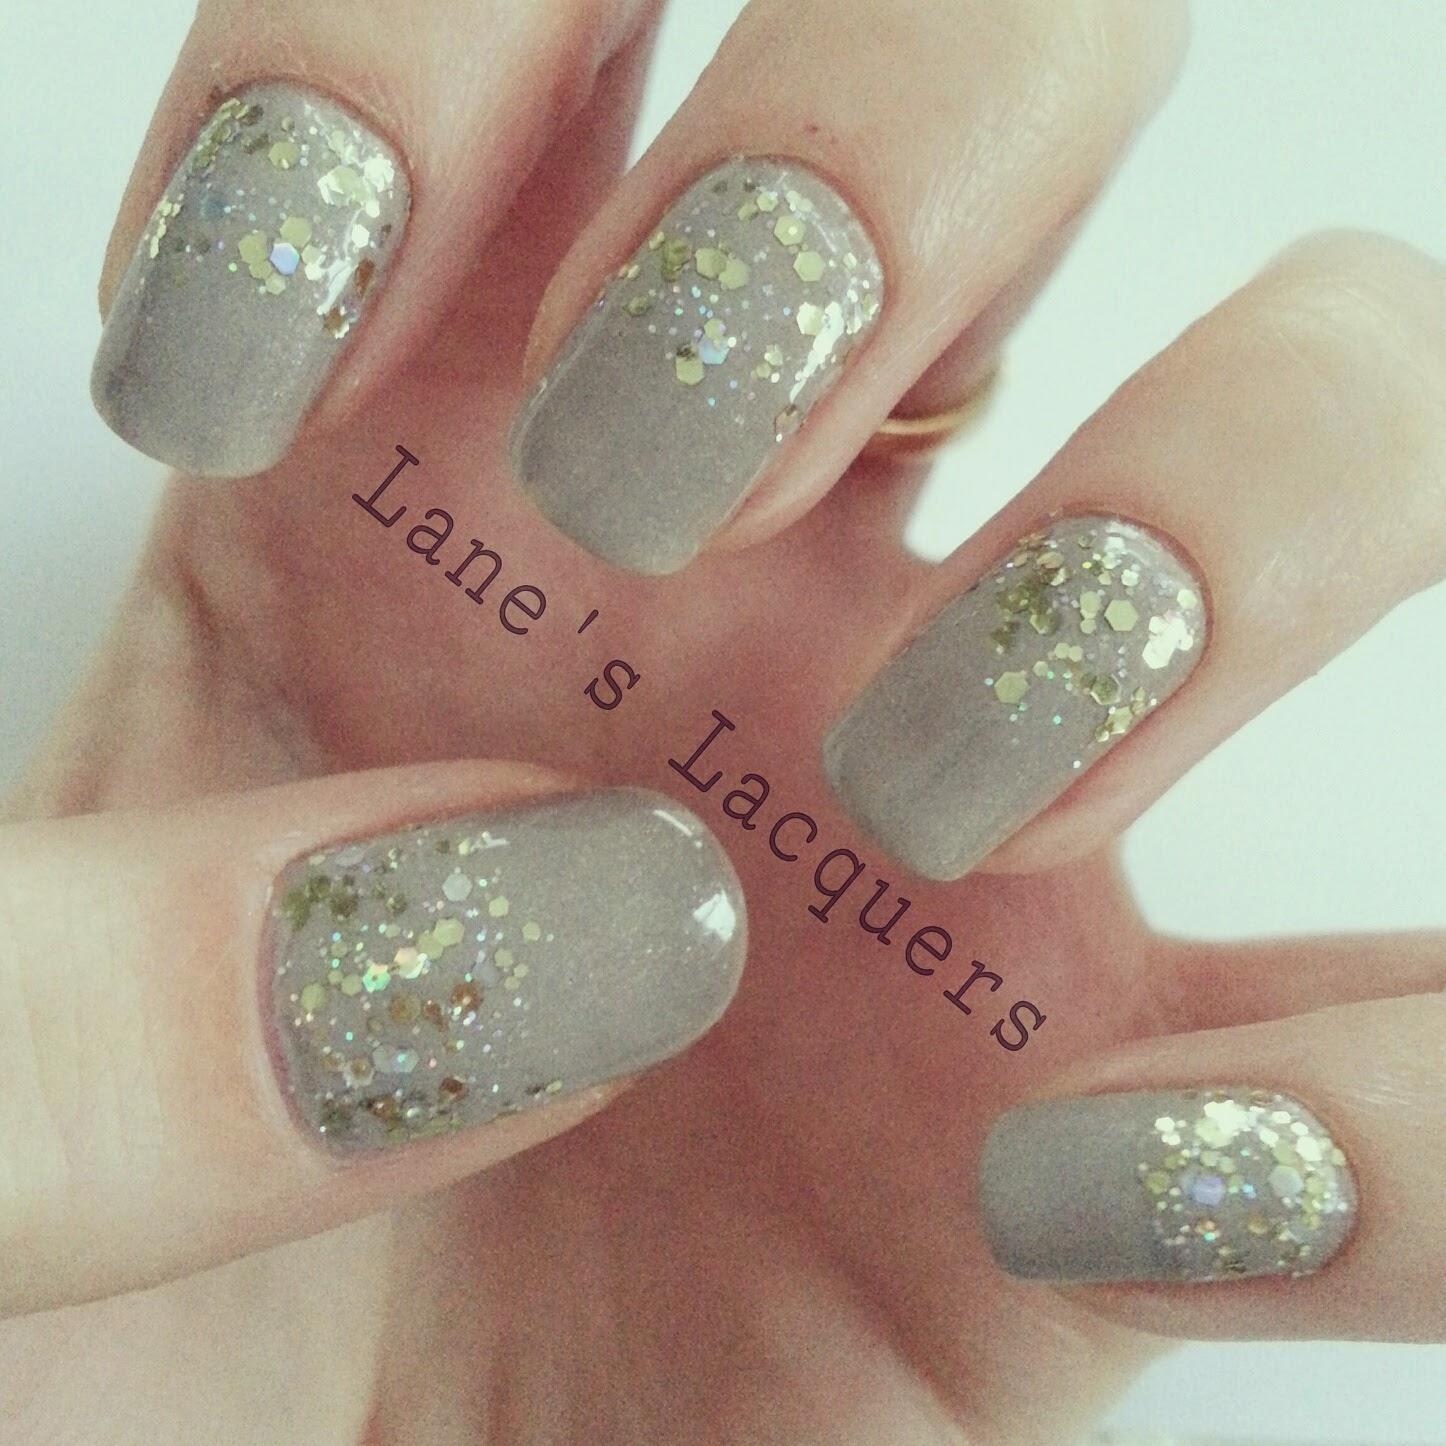 ciate-sharp-tailoring-gold-glitter-gradient-nail-art